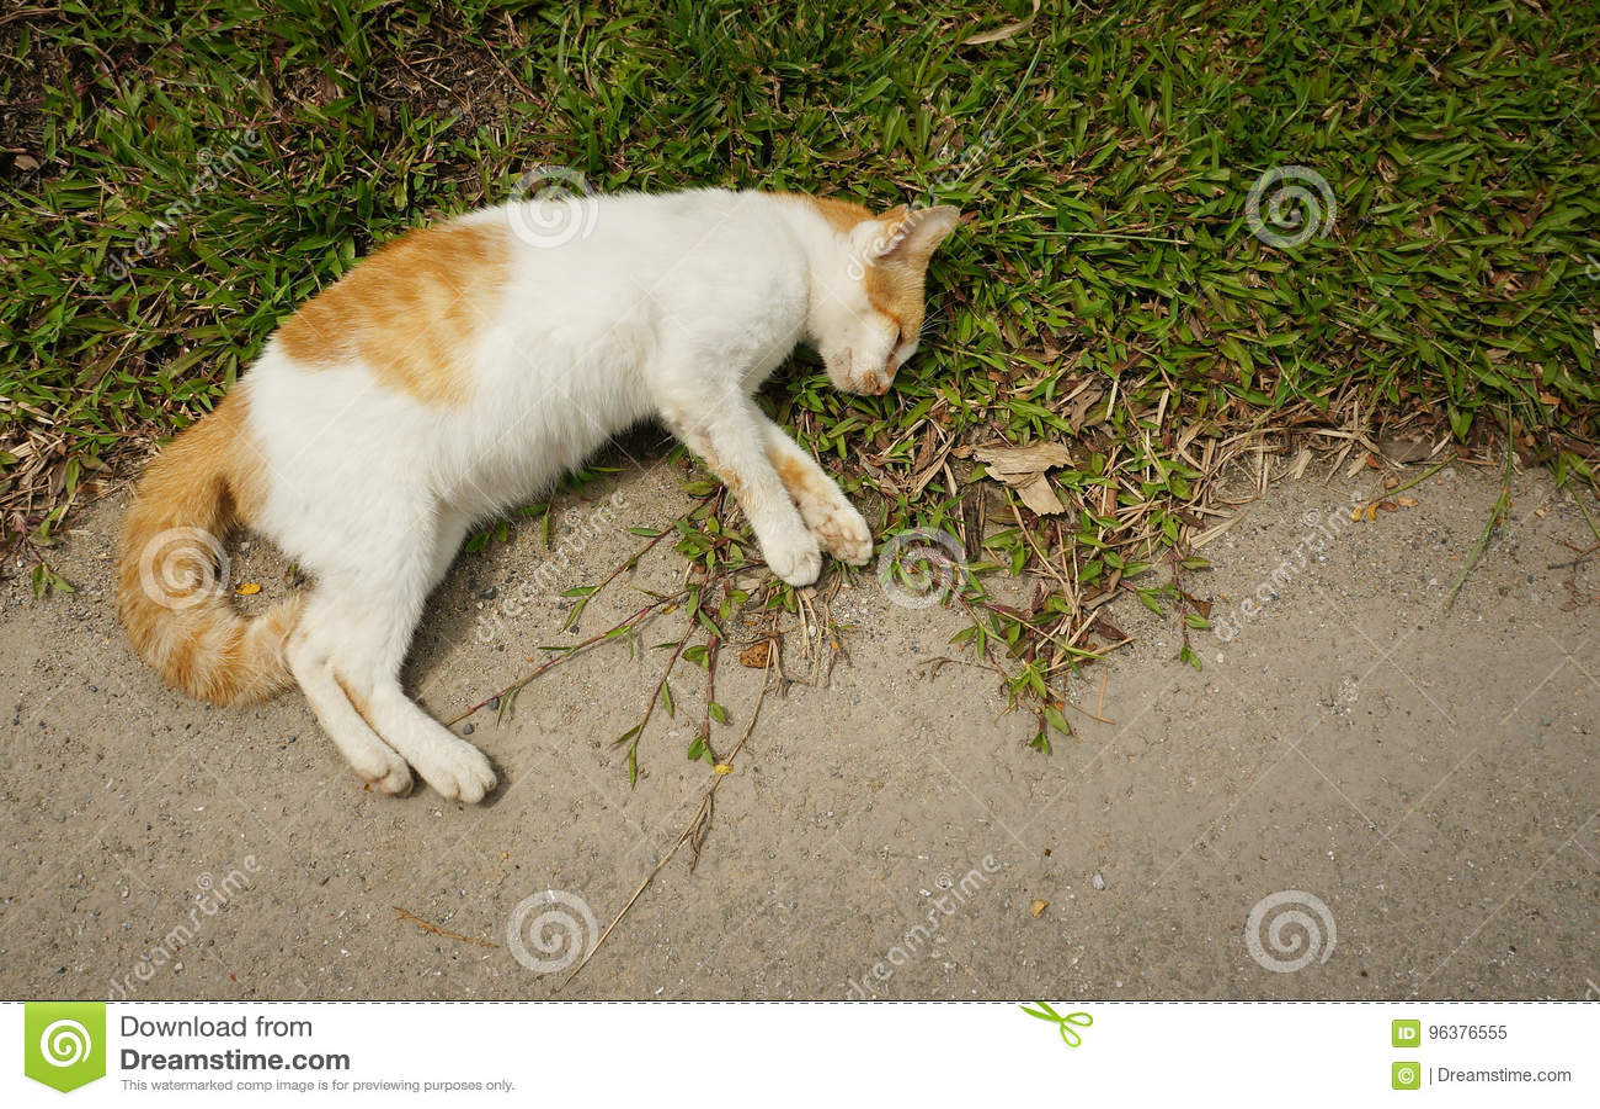 cat poop fudge